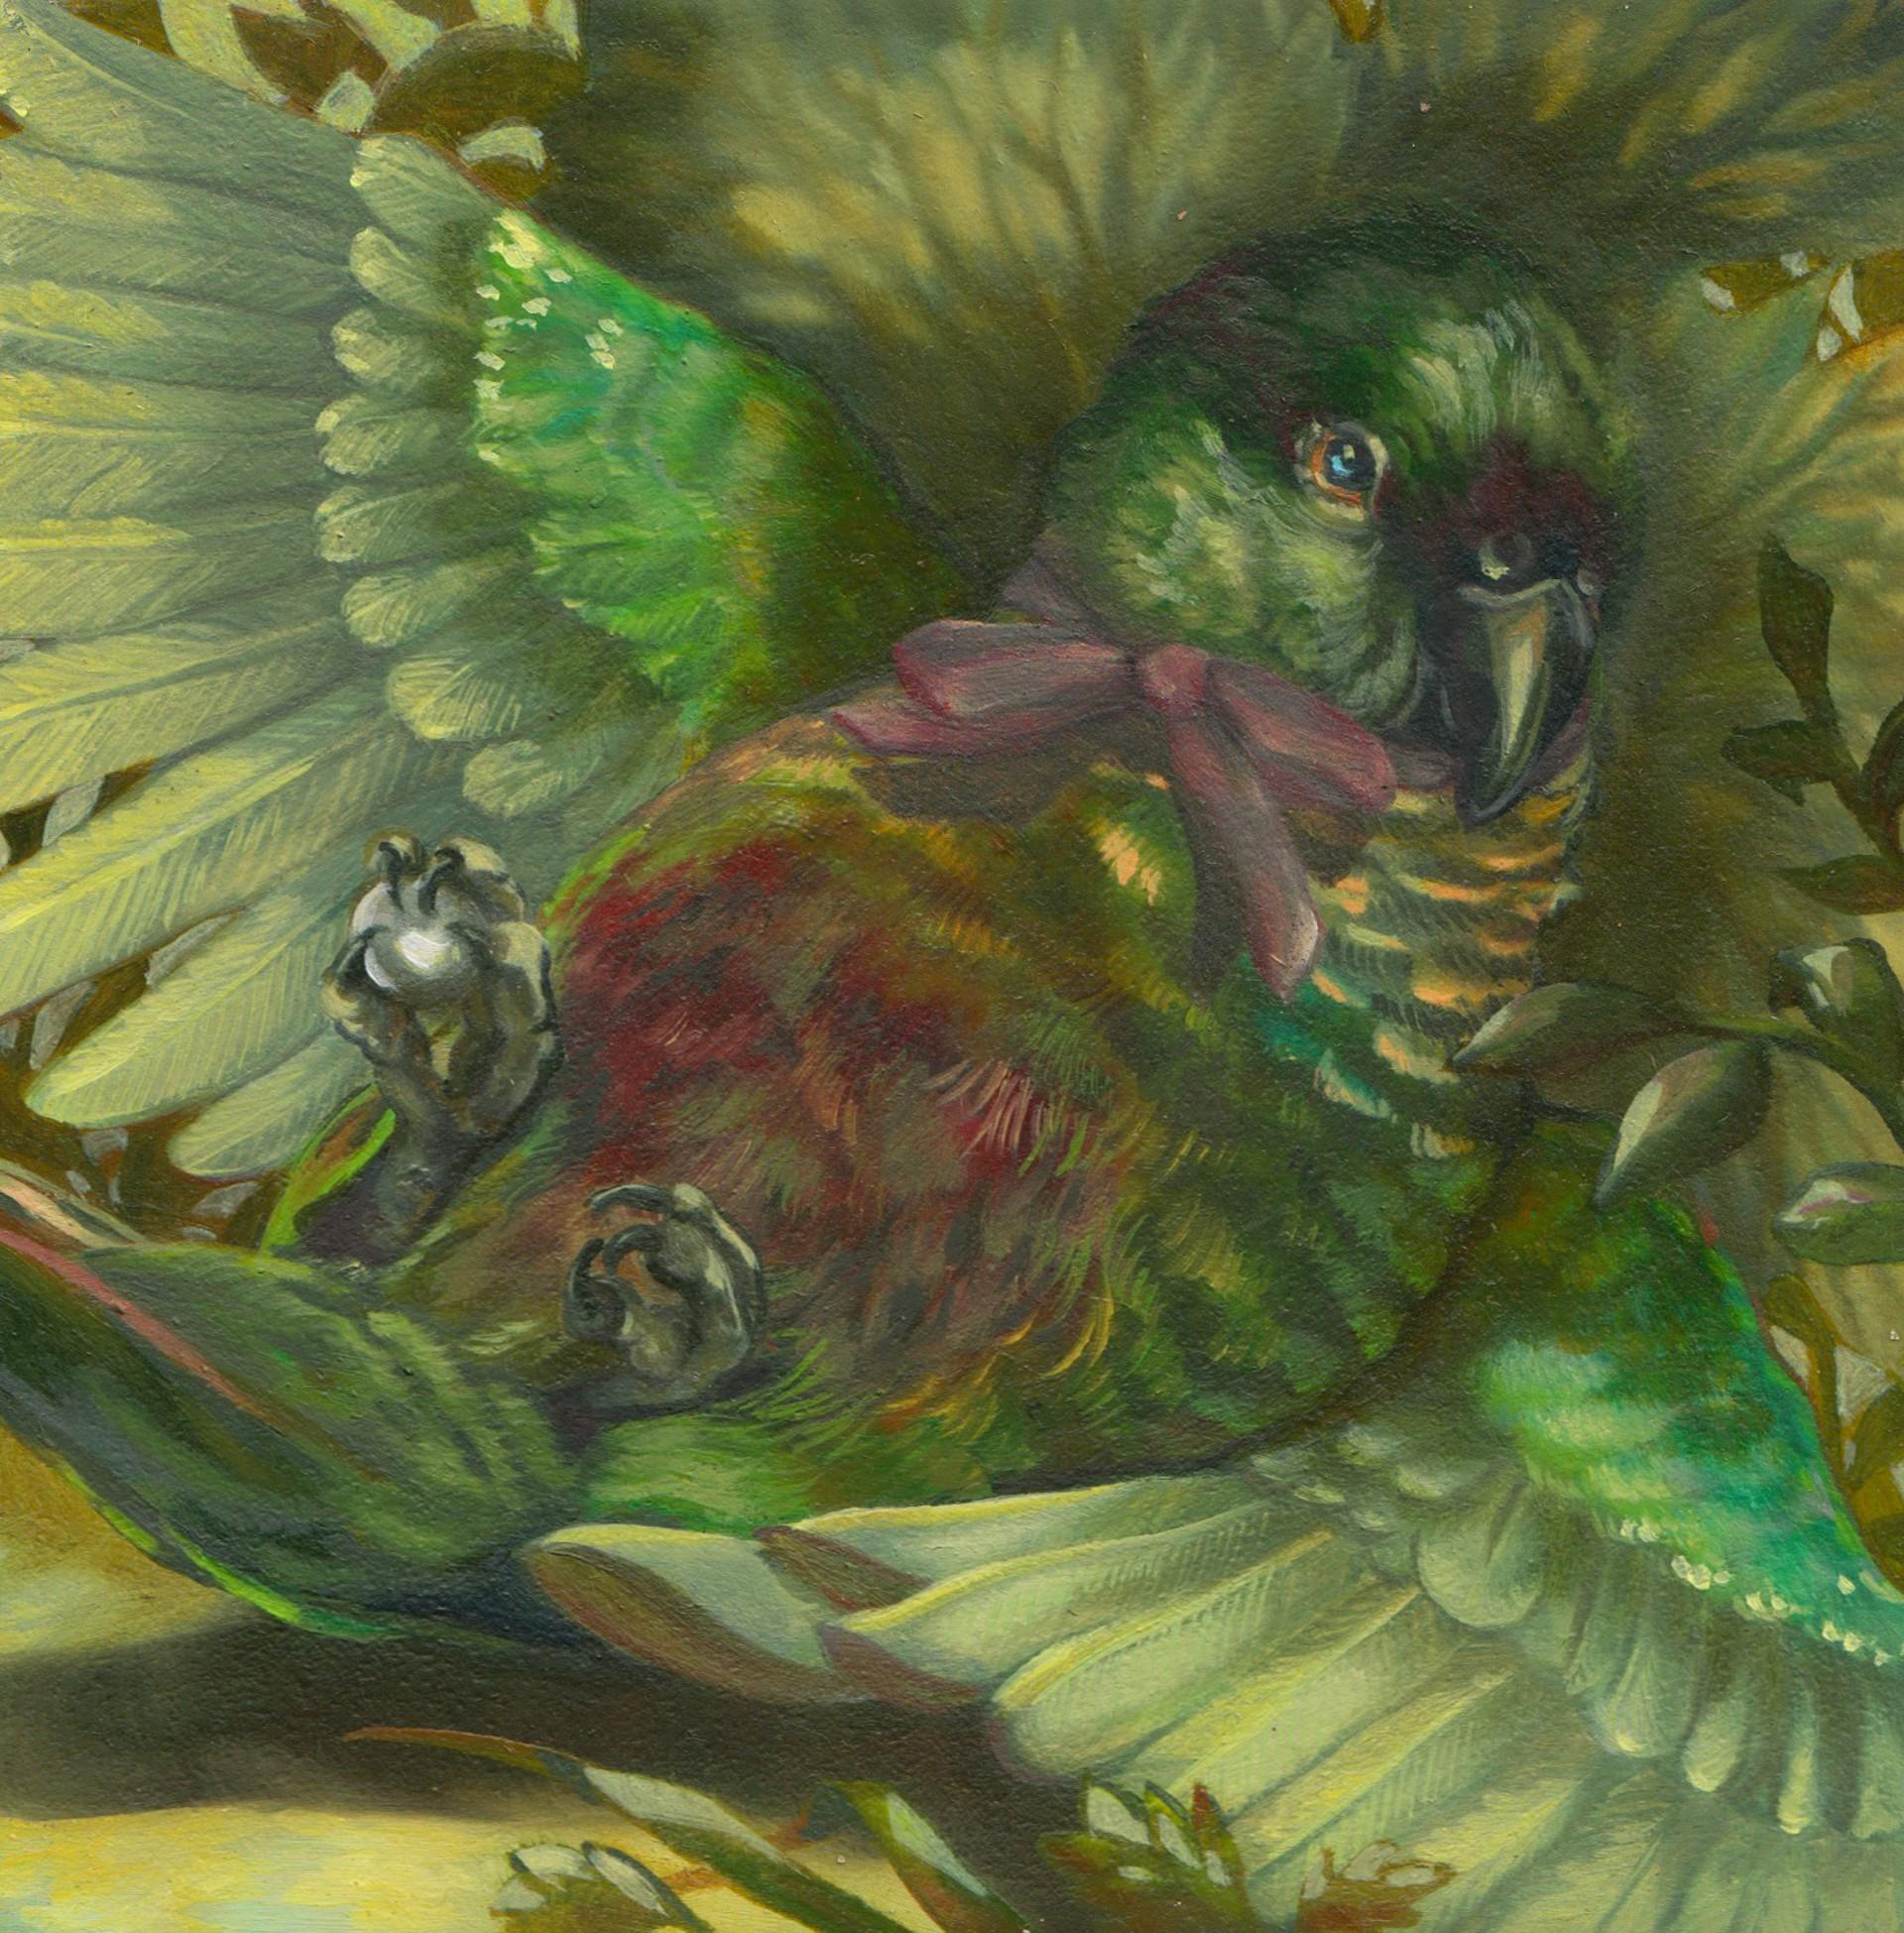 Colorful Display by Rhea O'Neill